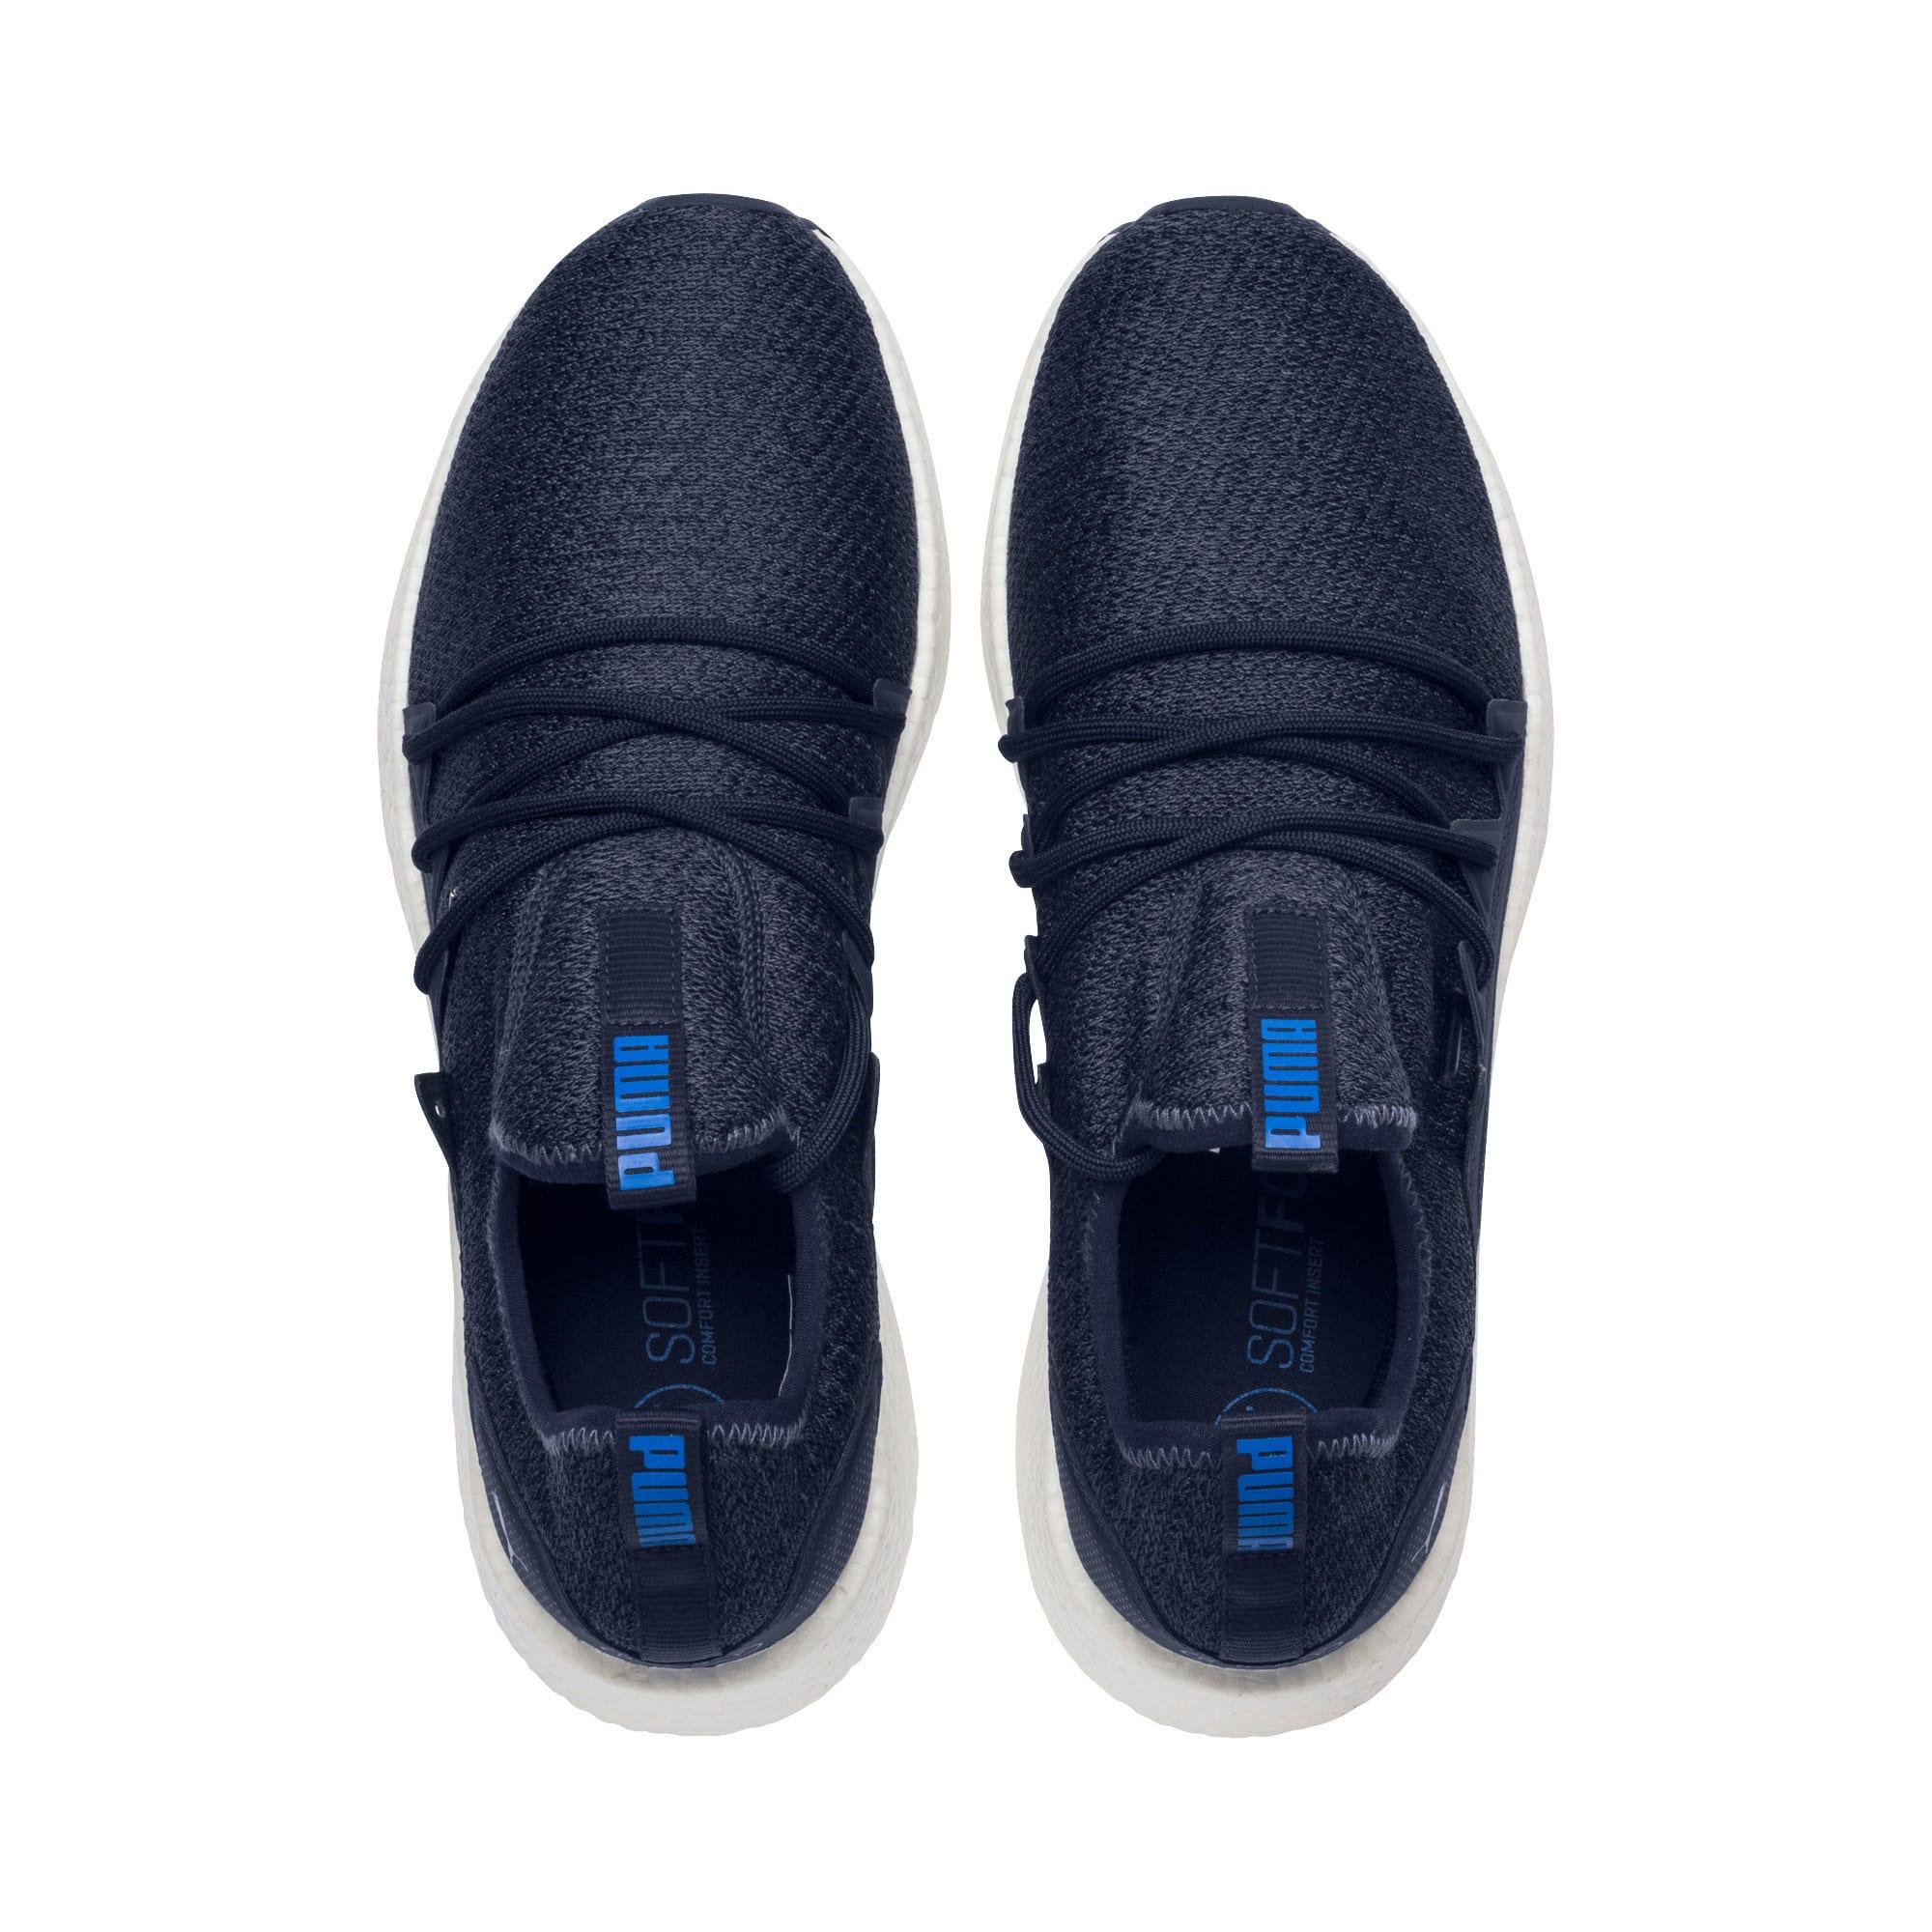 Miniatura 6 de Zapatos para correr NRGY Neko Knit para hombre, Peacoat-Strong Blue, mediano